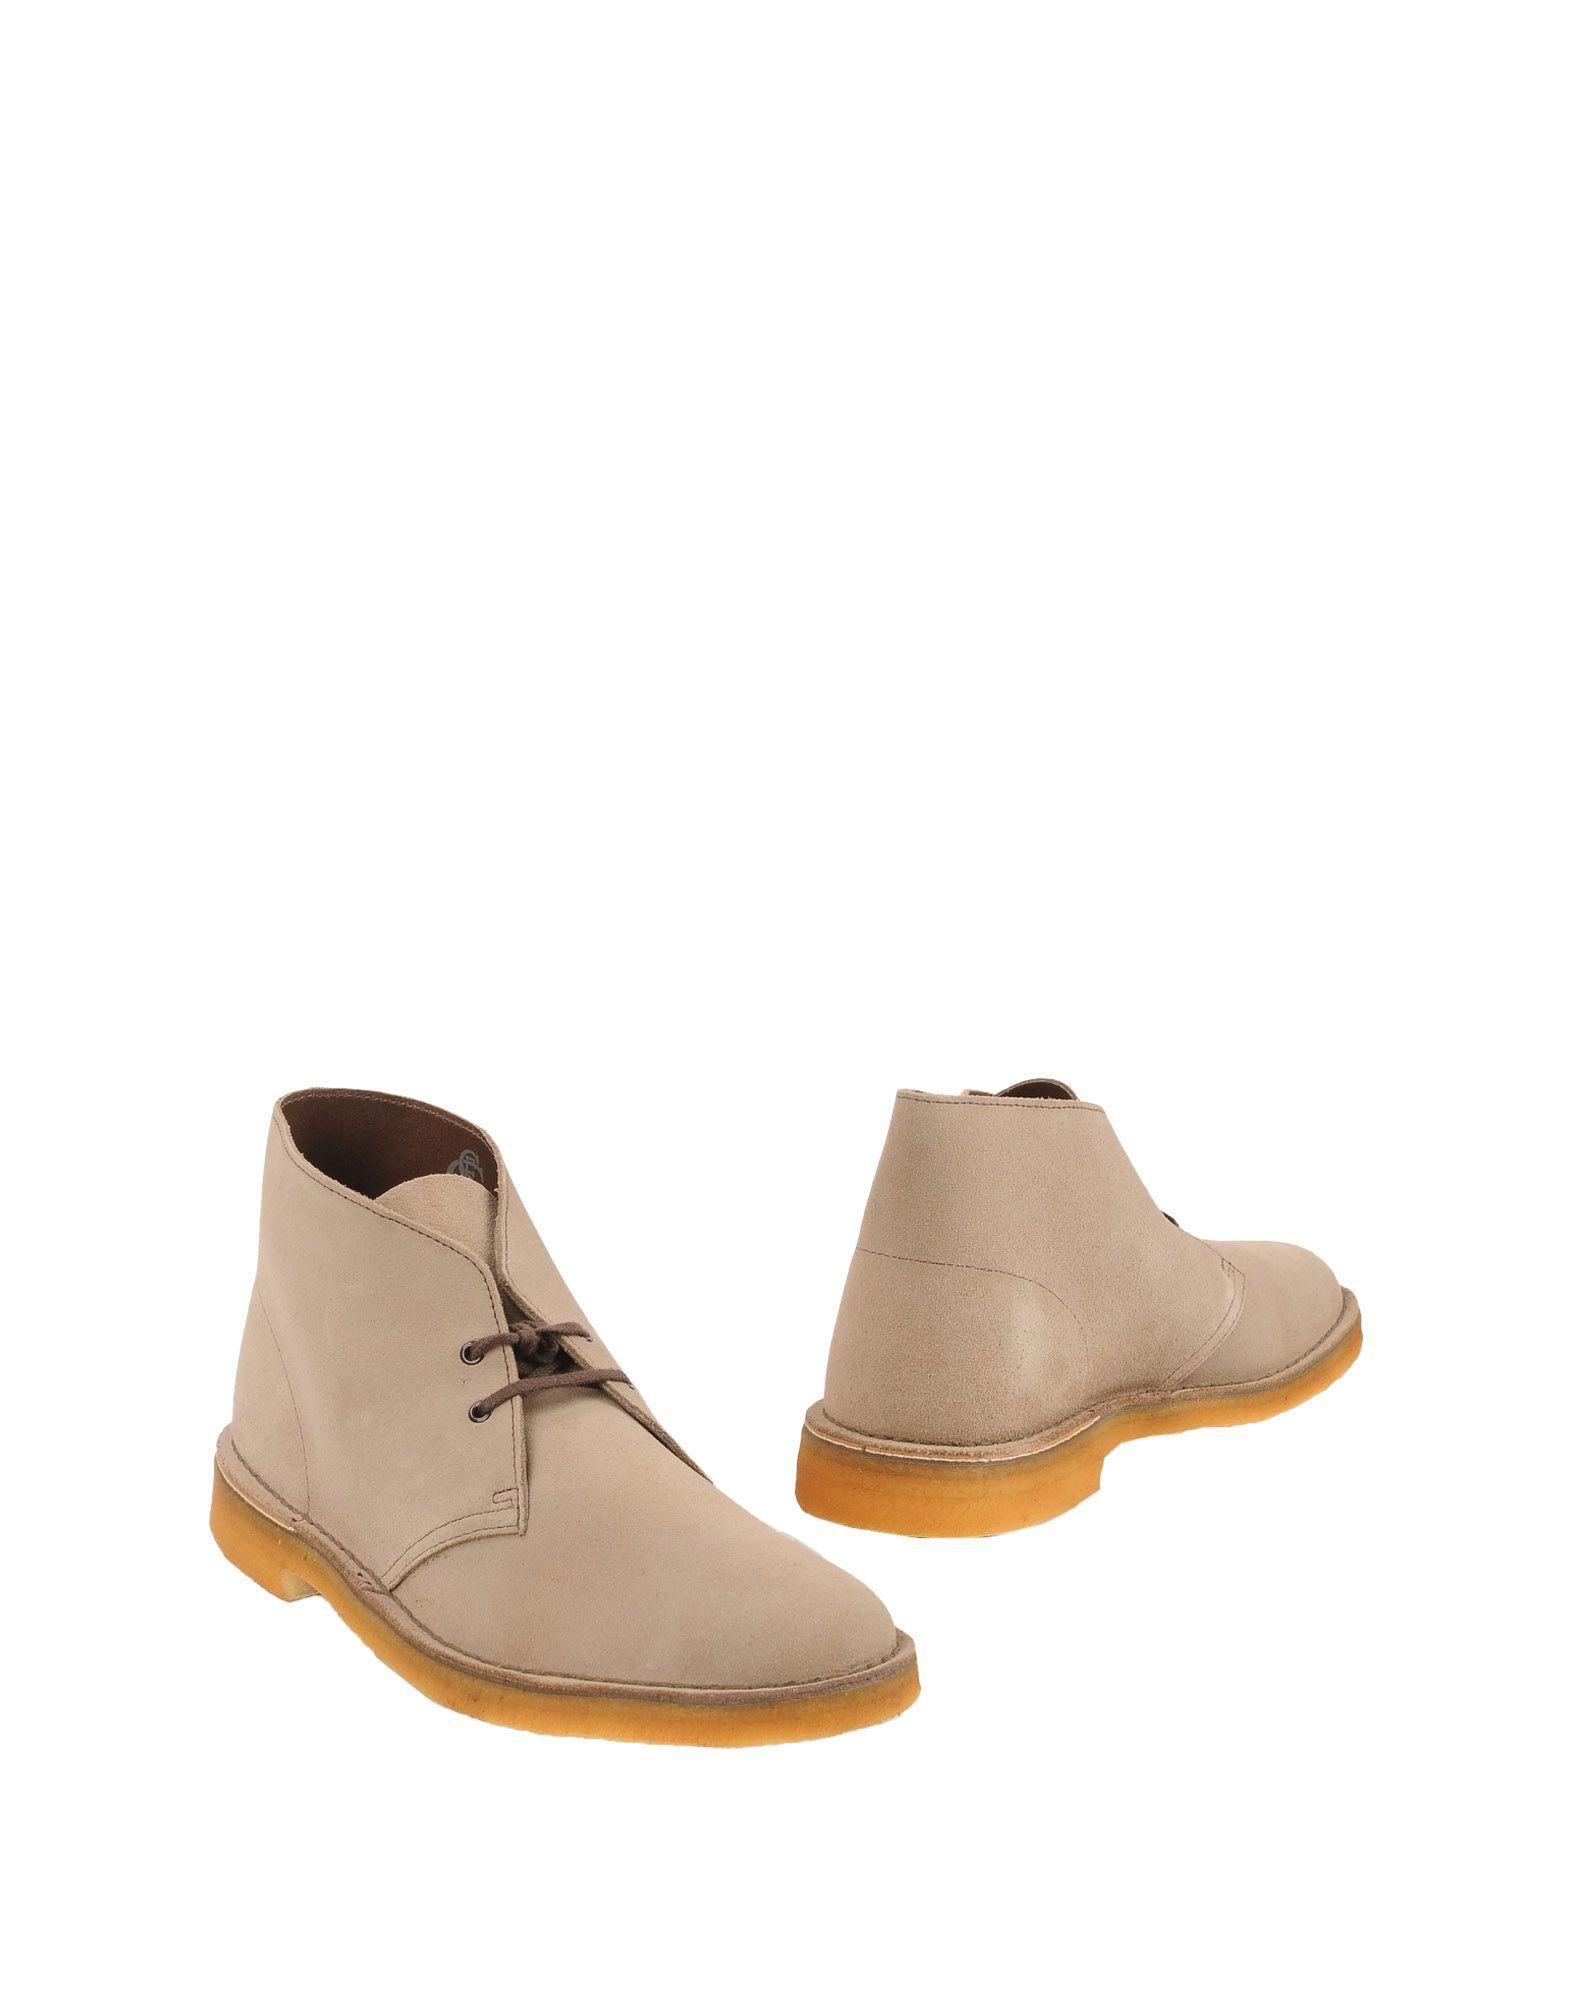 Clarks Originals Desert Boot  11336610LG